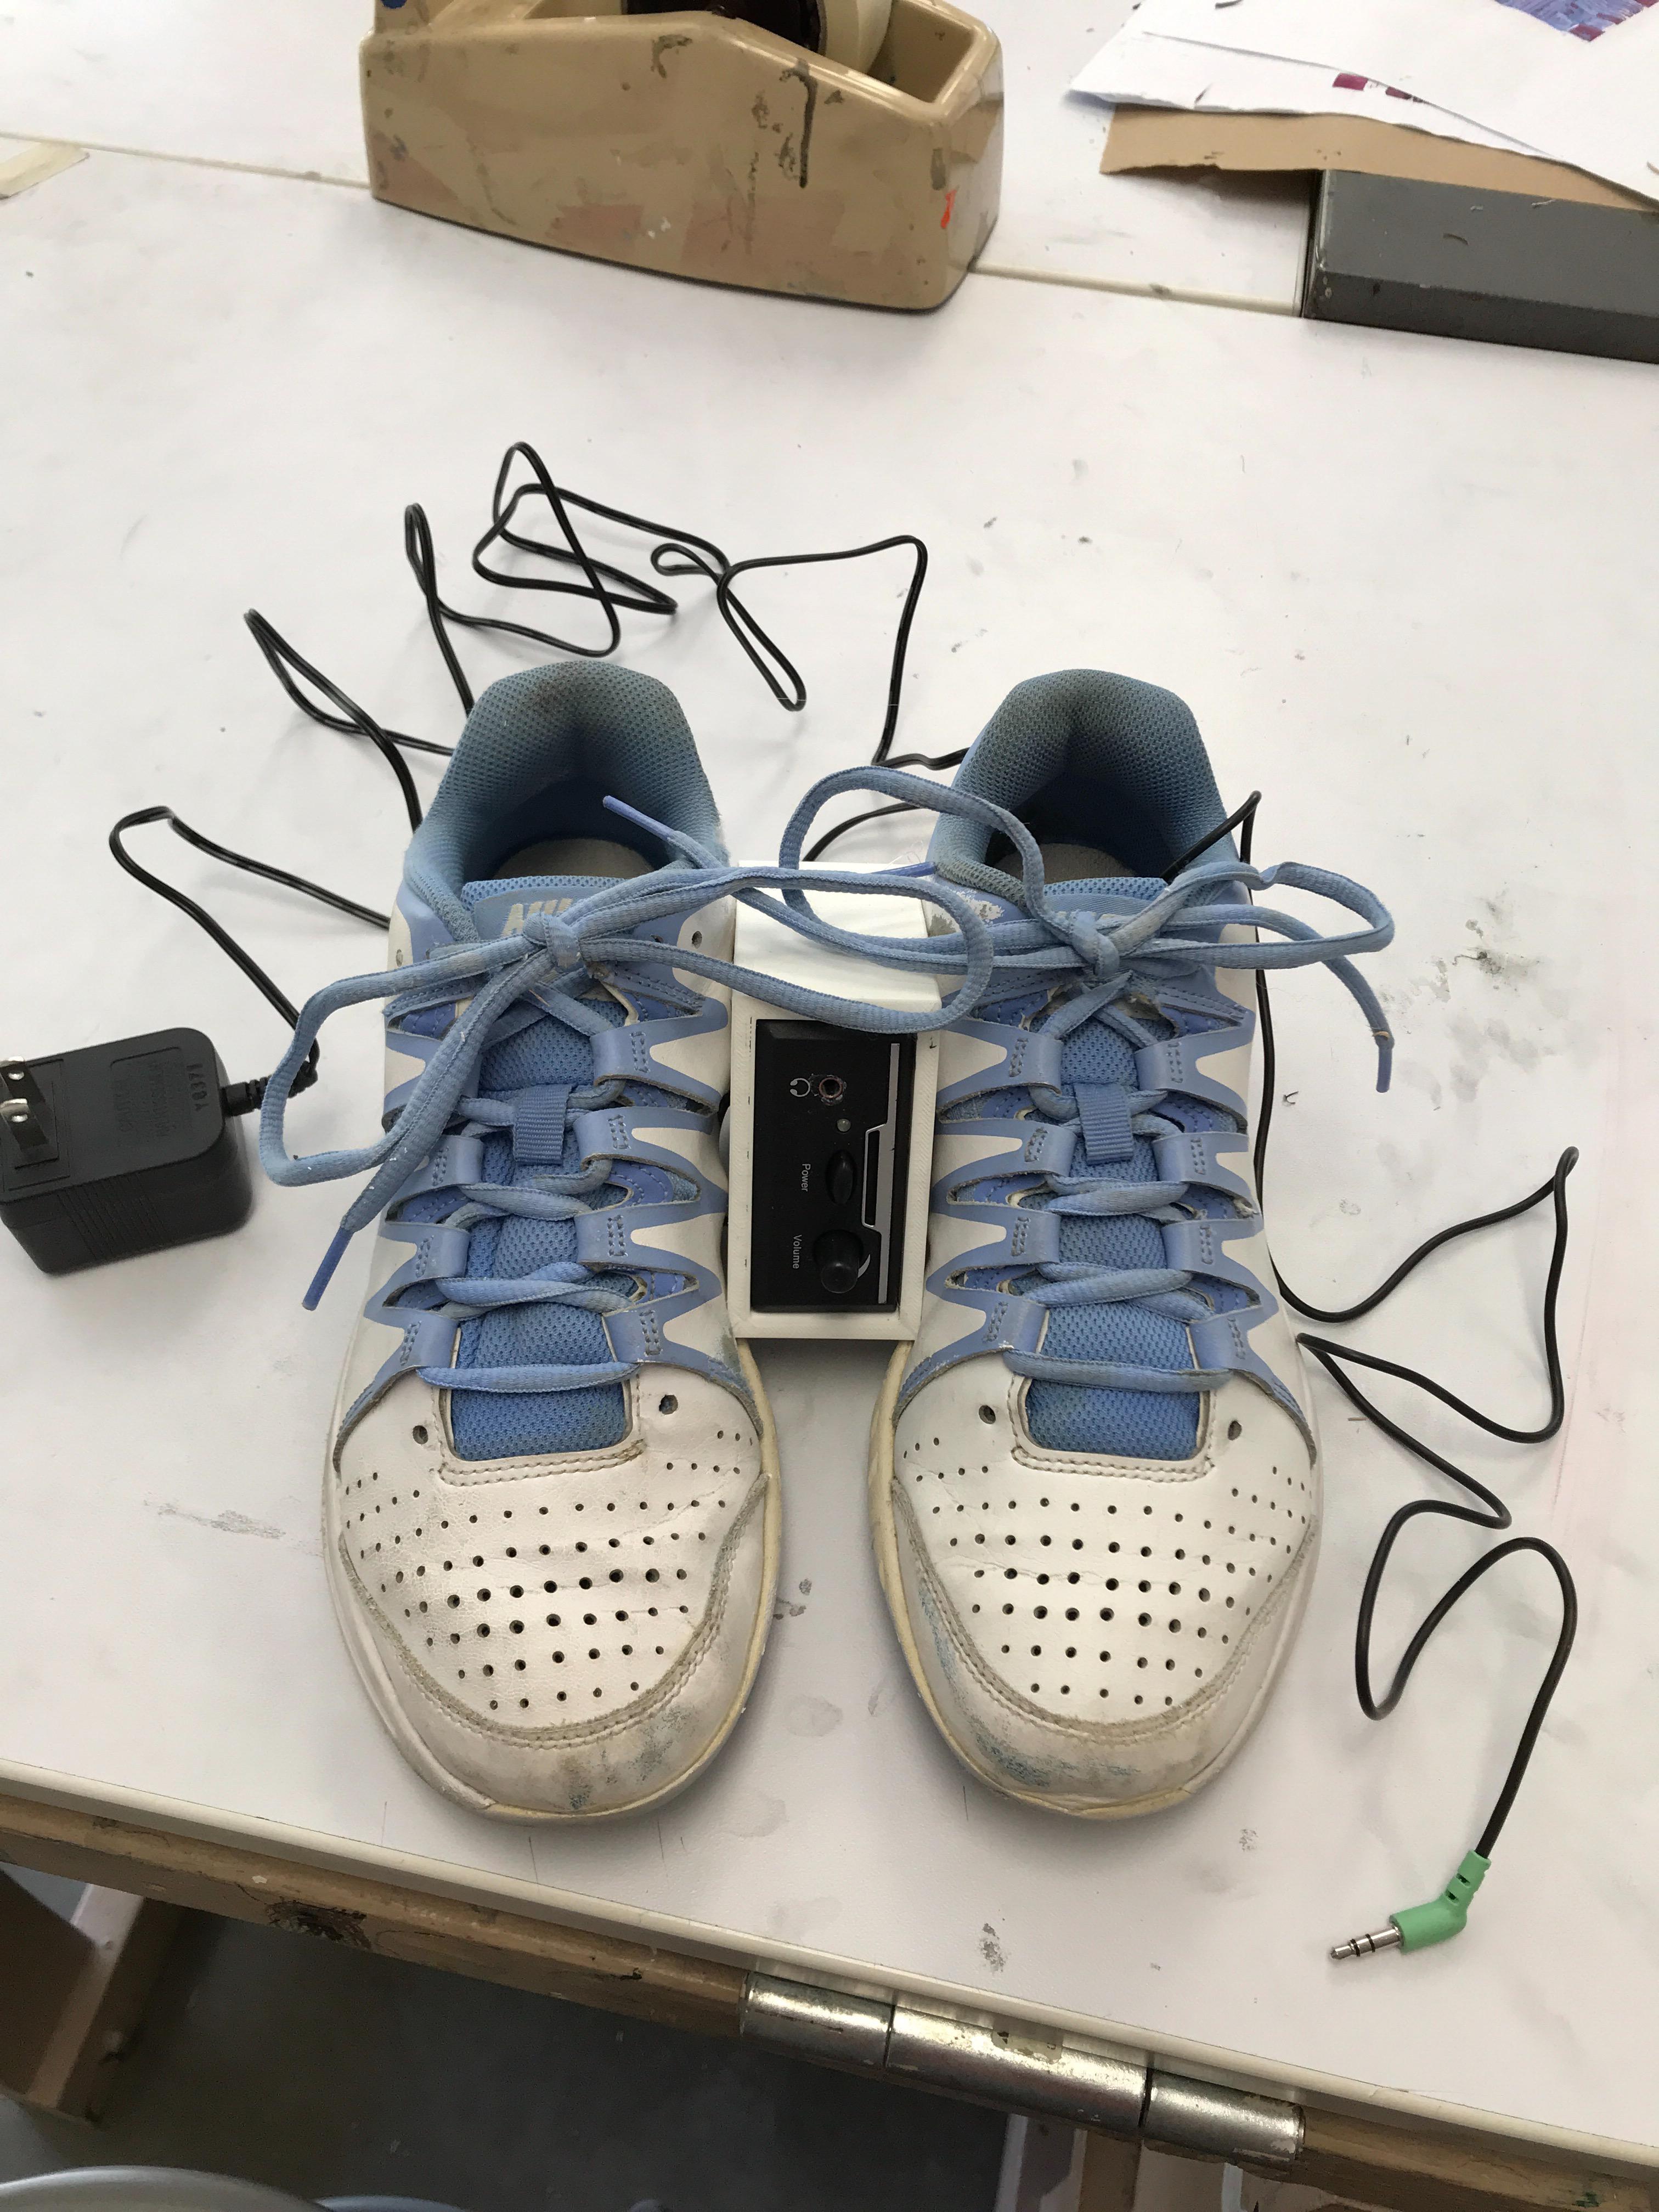 Picture of Sneaker Speaker